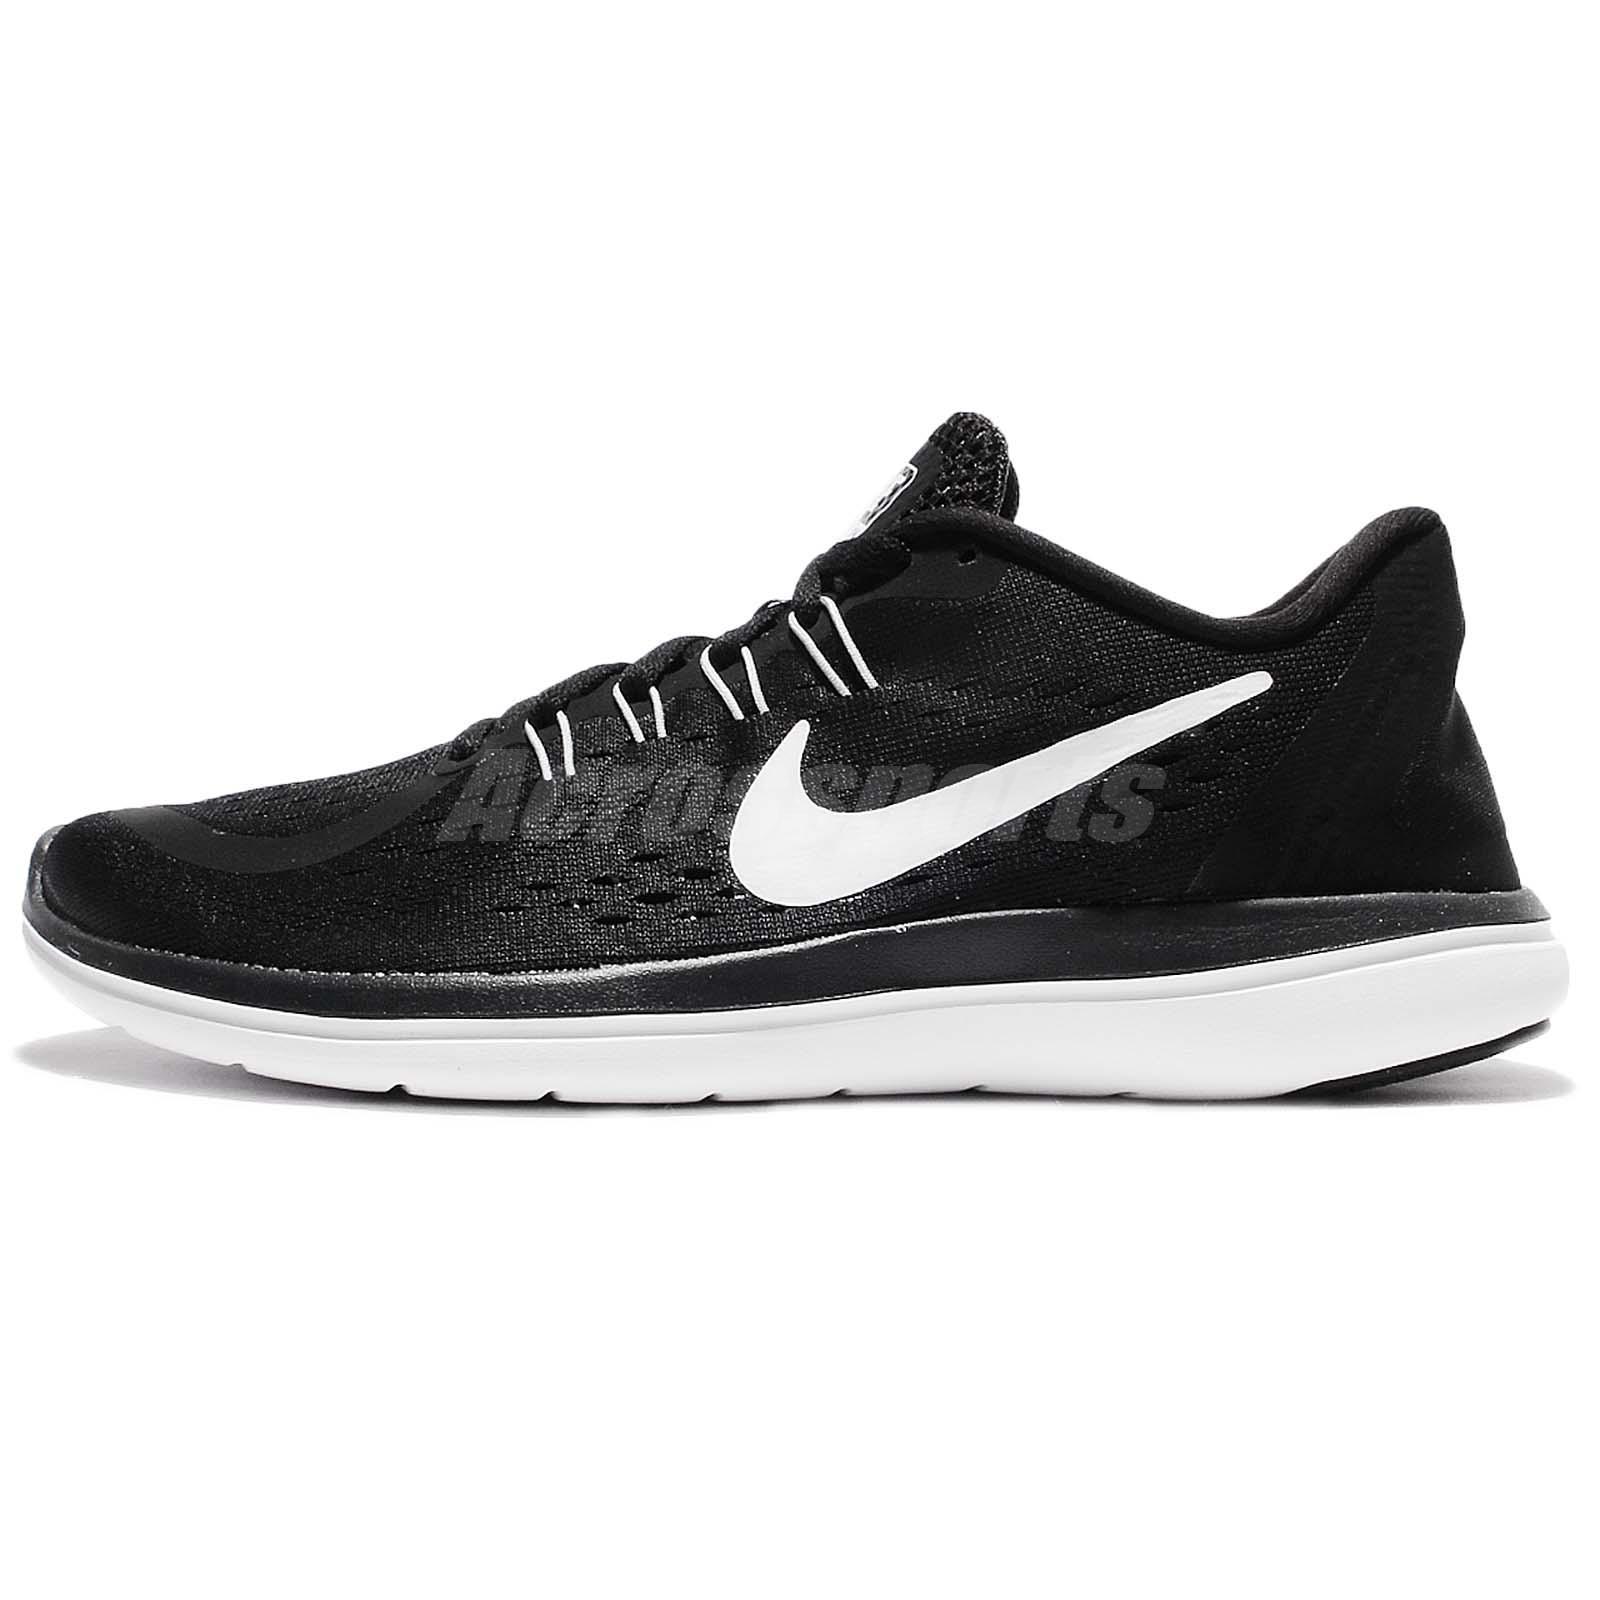 premium selection b4bf2 c4ae1 Wmns Nike Flex 2017 RN Run Black White Women Running Shoes Sneakers  898476-001